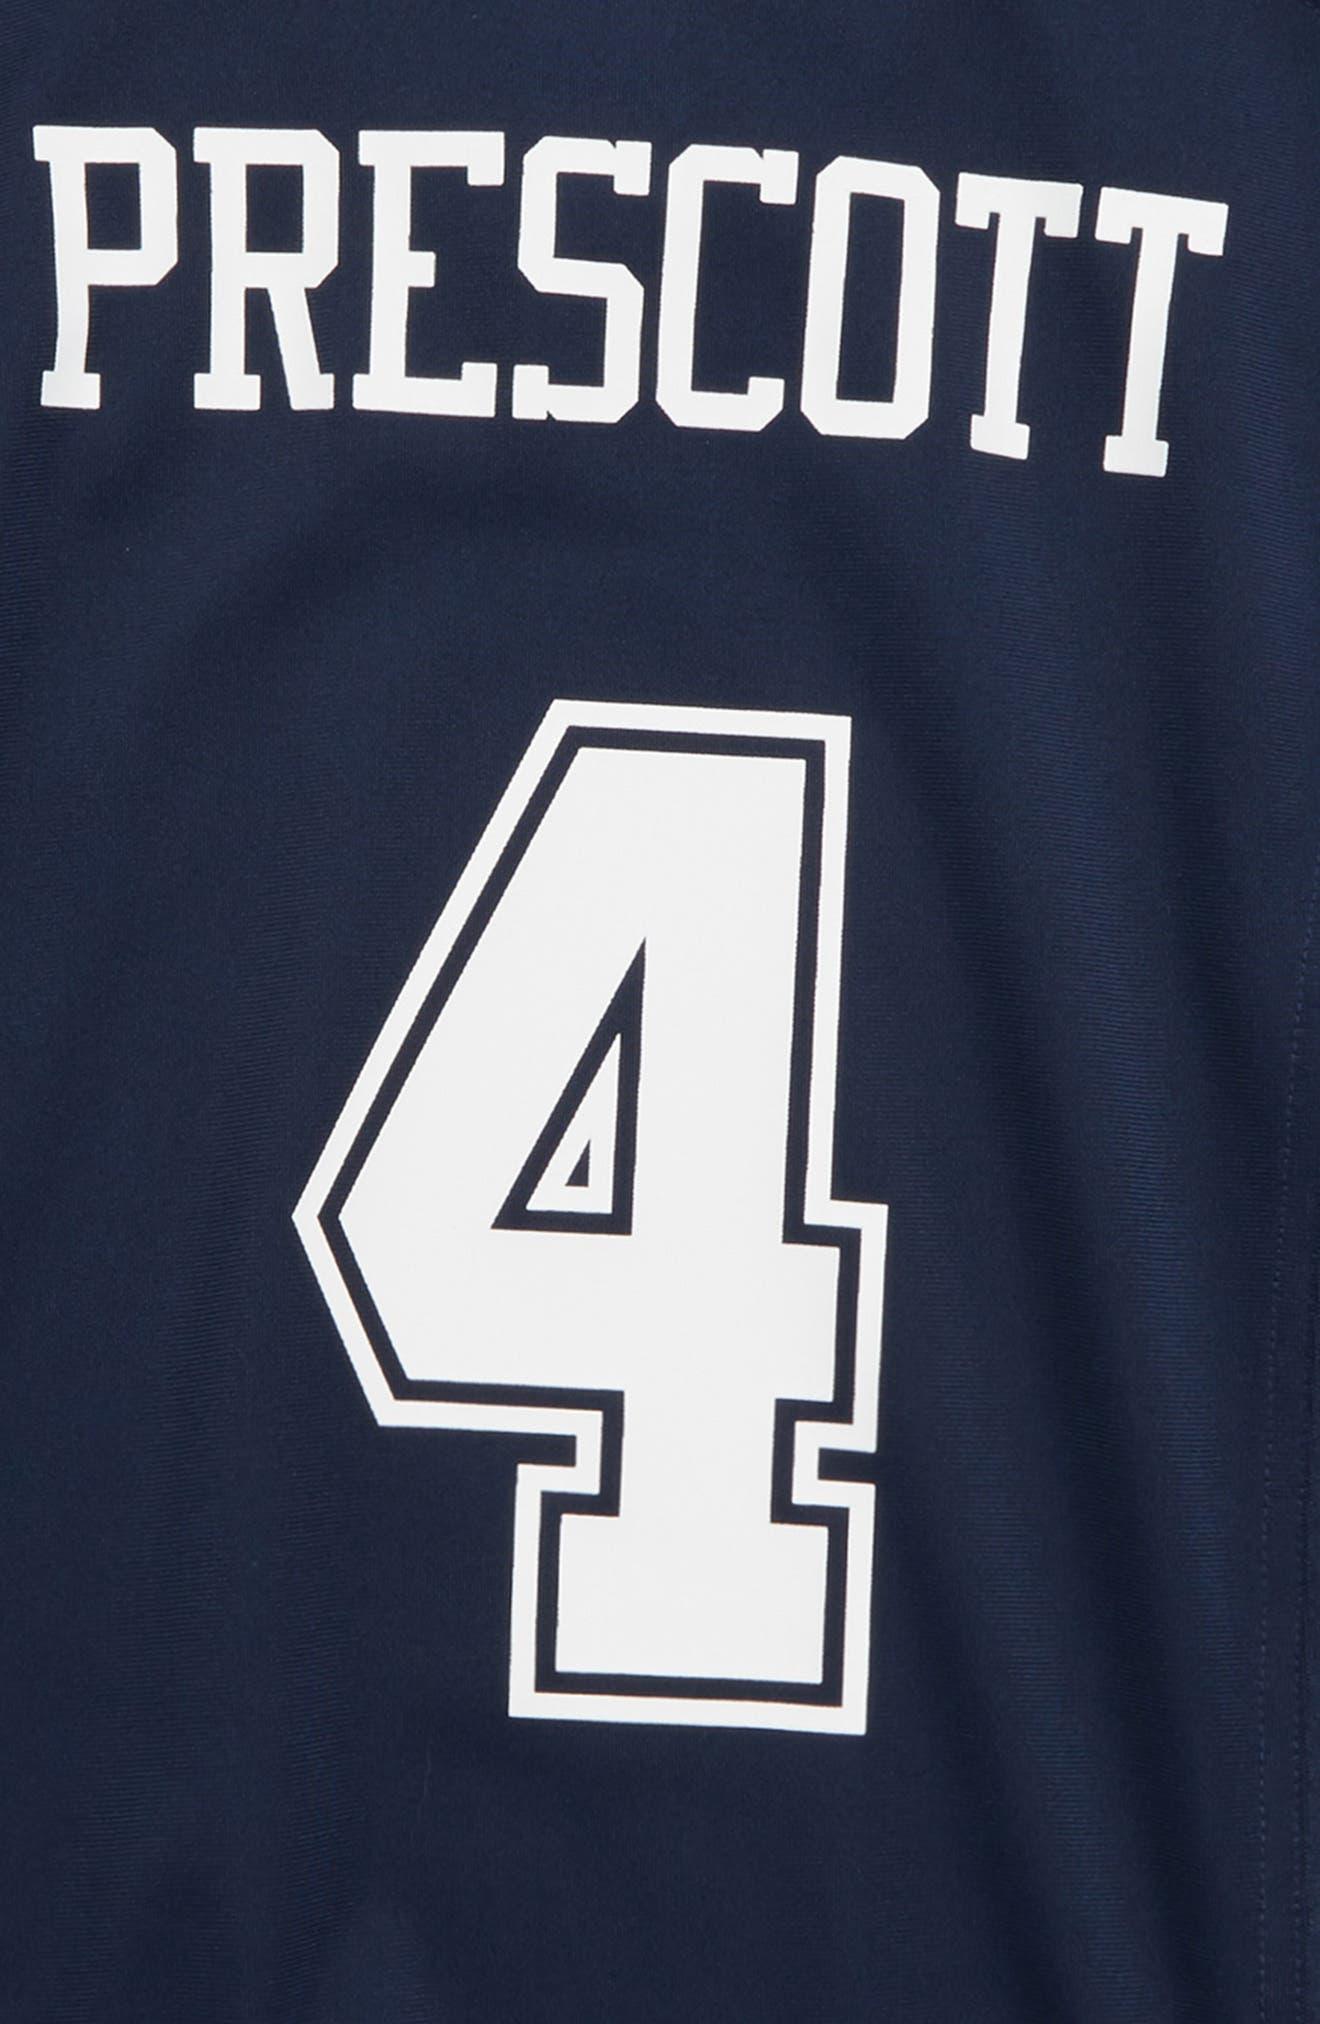 Nike NFL Dallas Cowboys – Dak Prescott Jersey,                             Alternate thumbnail 3, color,                             NAVY